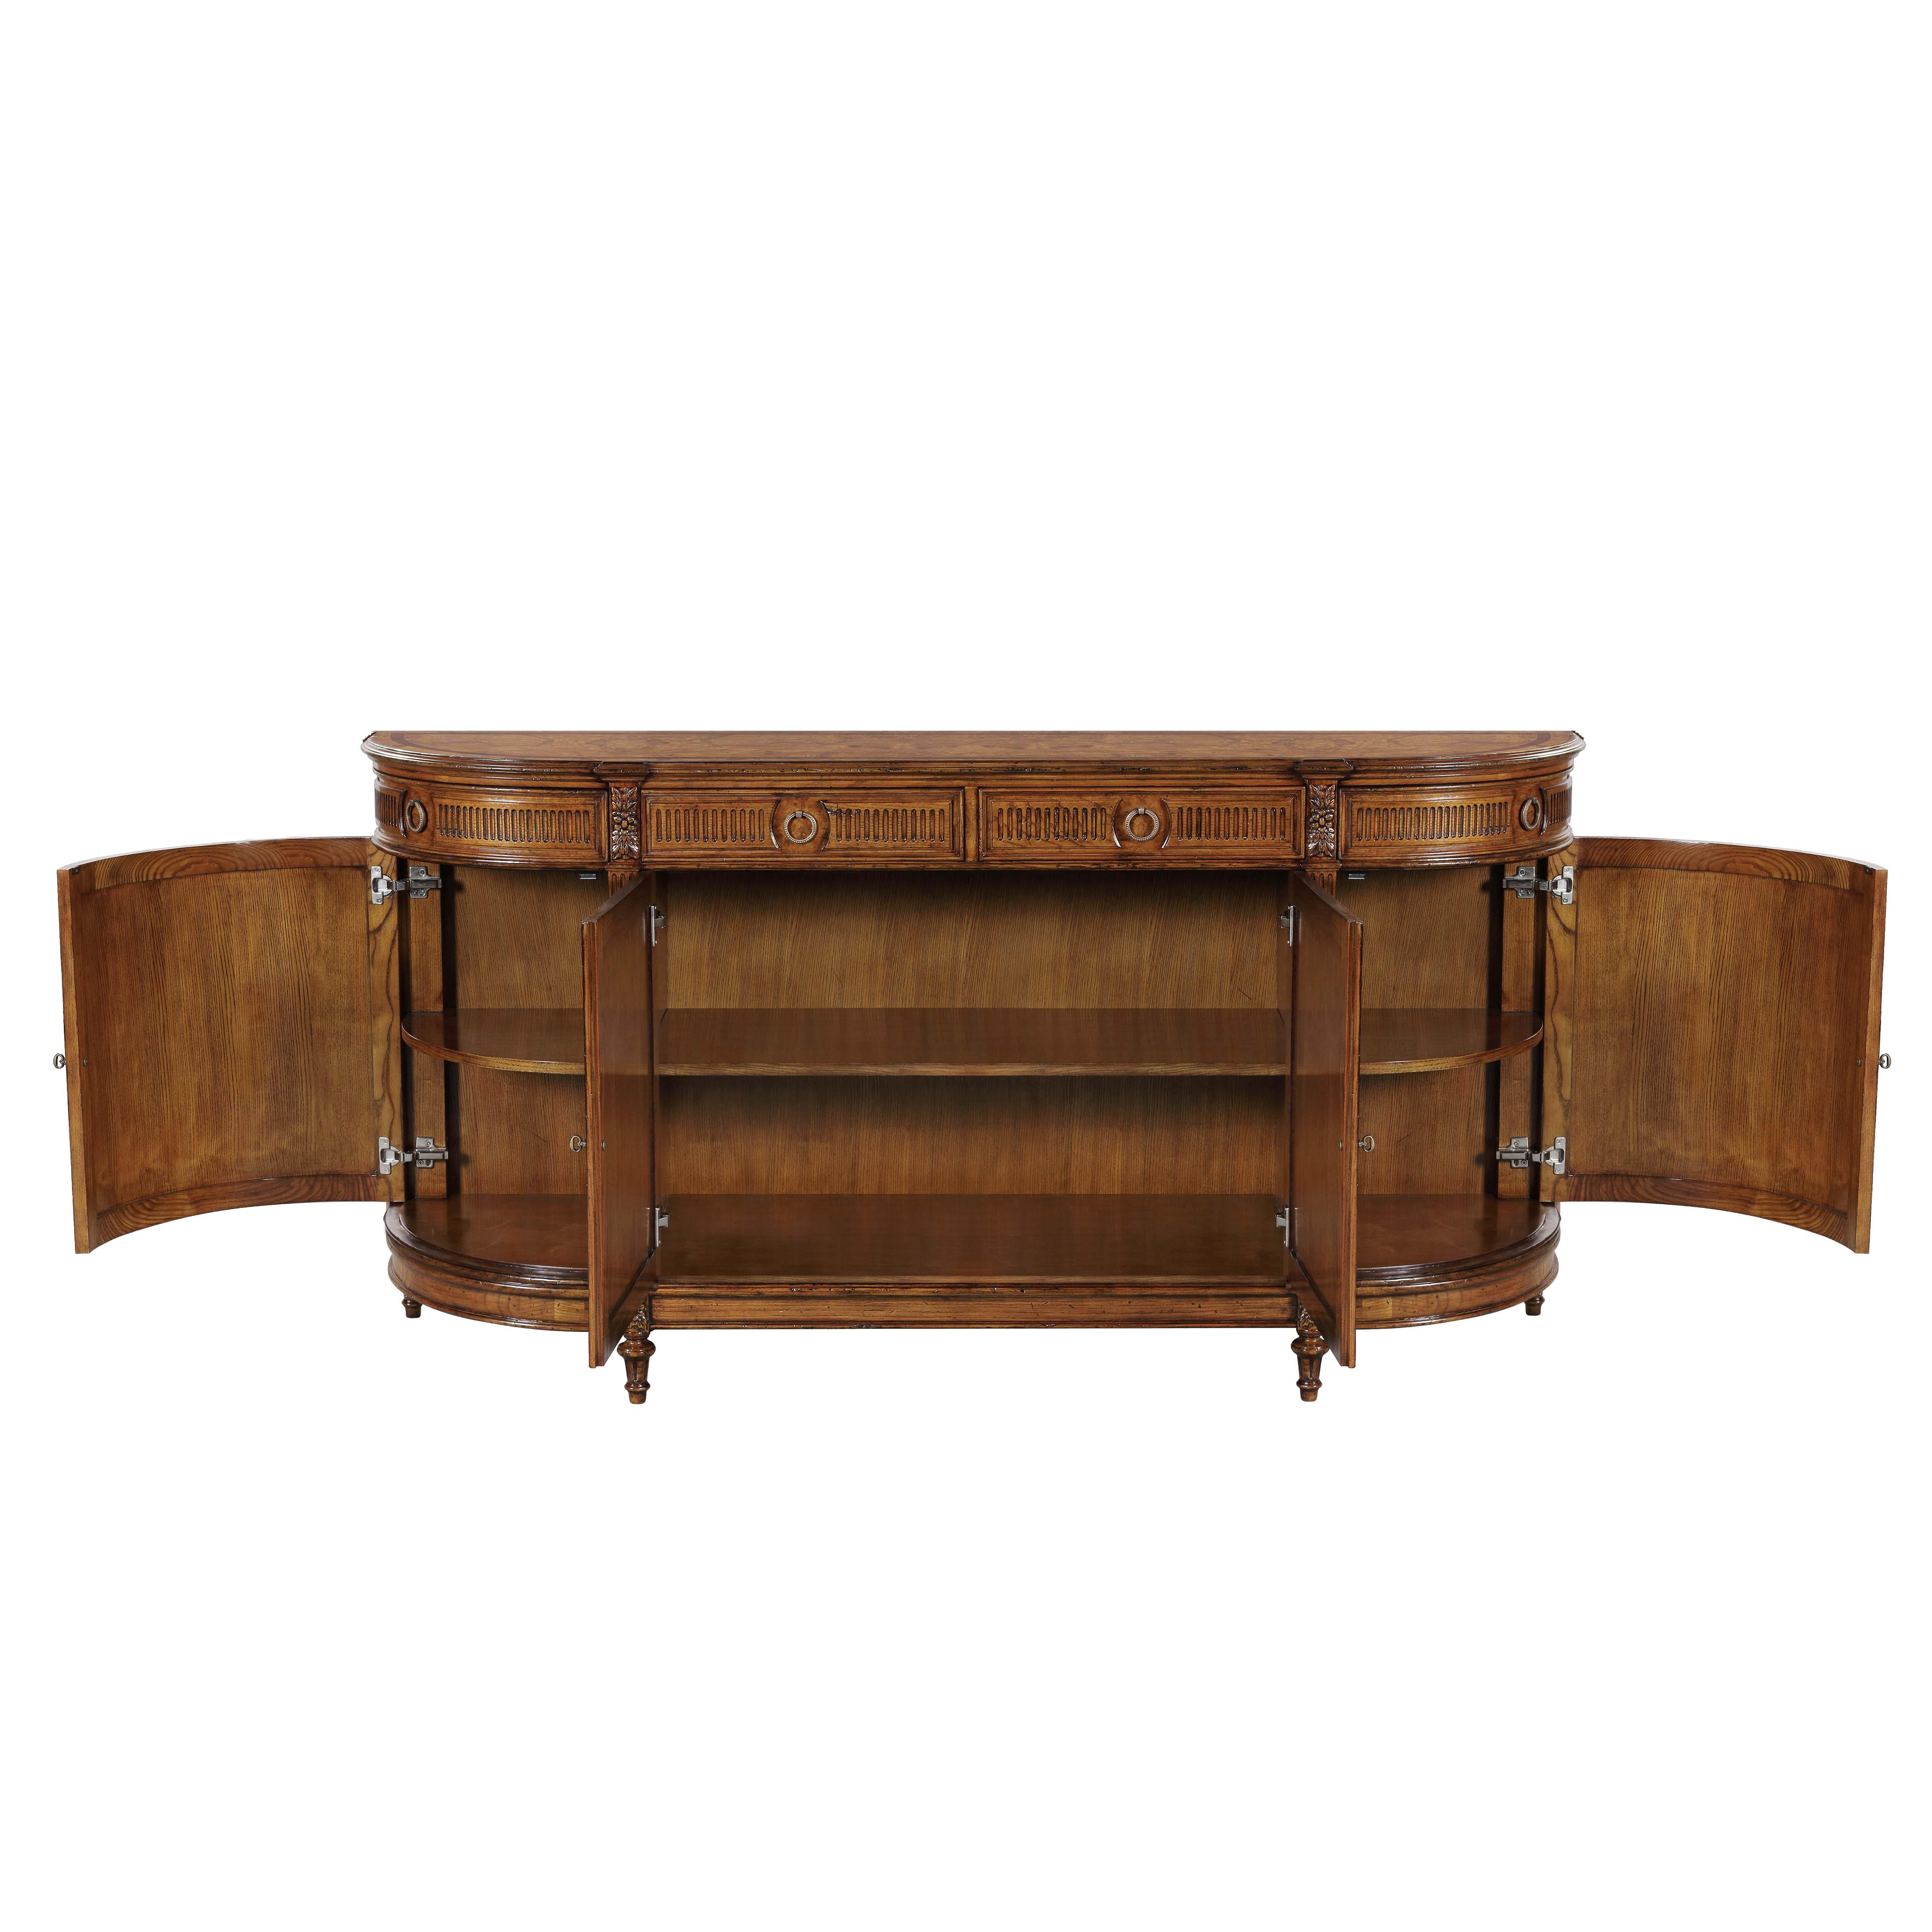 sideboard oak front nestnordic open sterling hutch table black zillo product